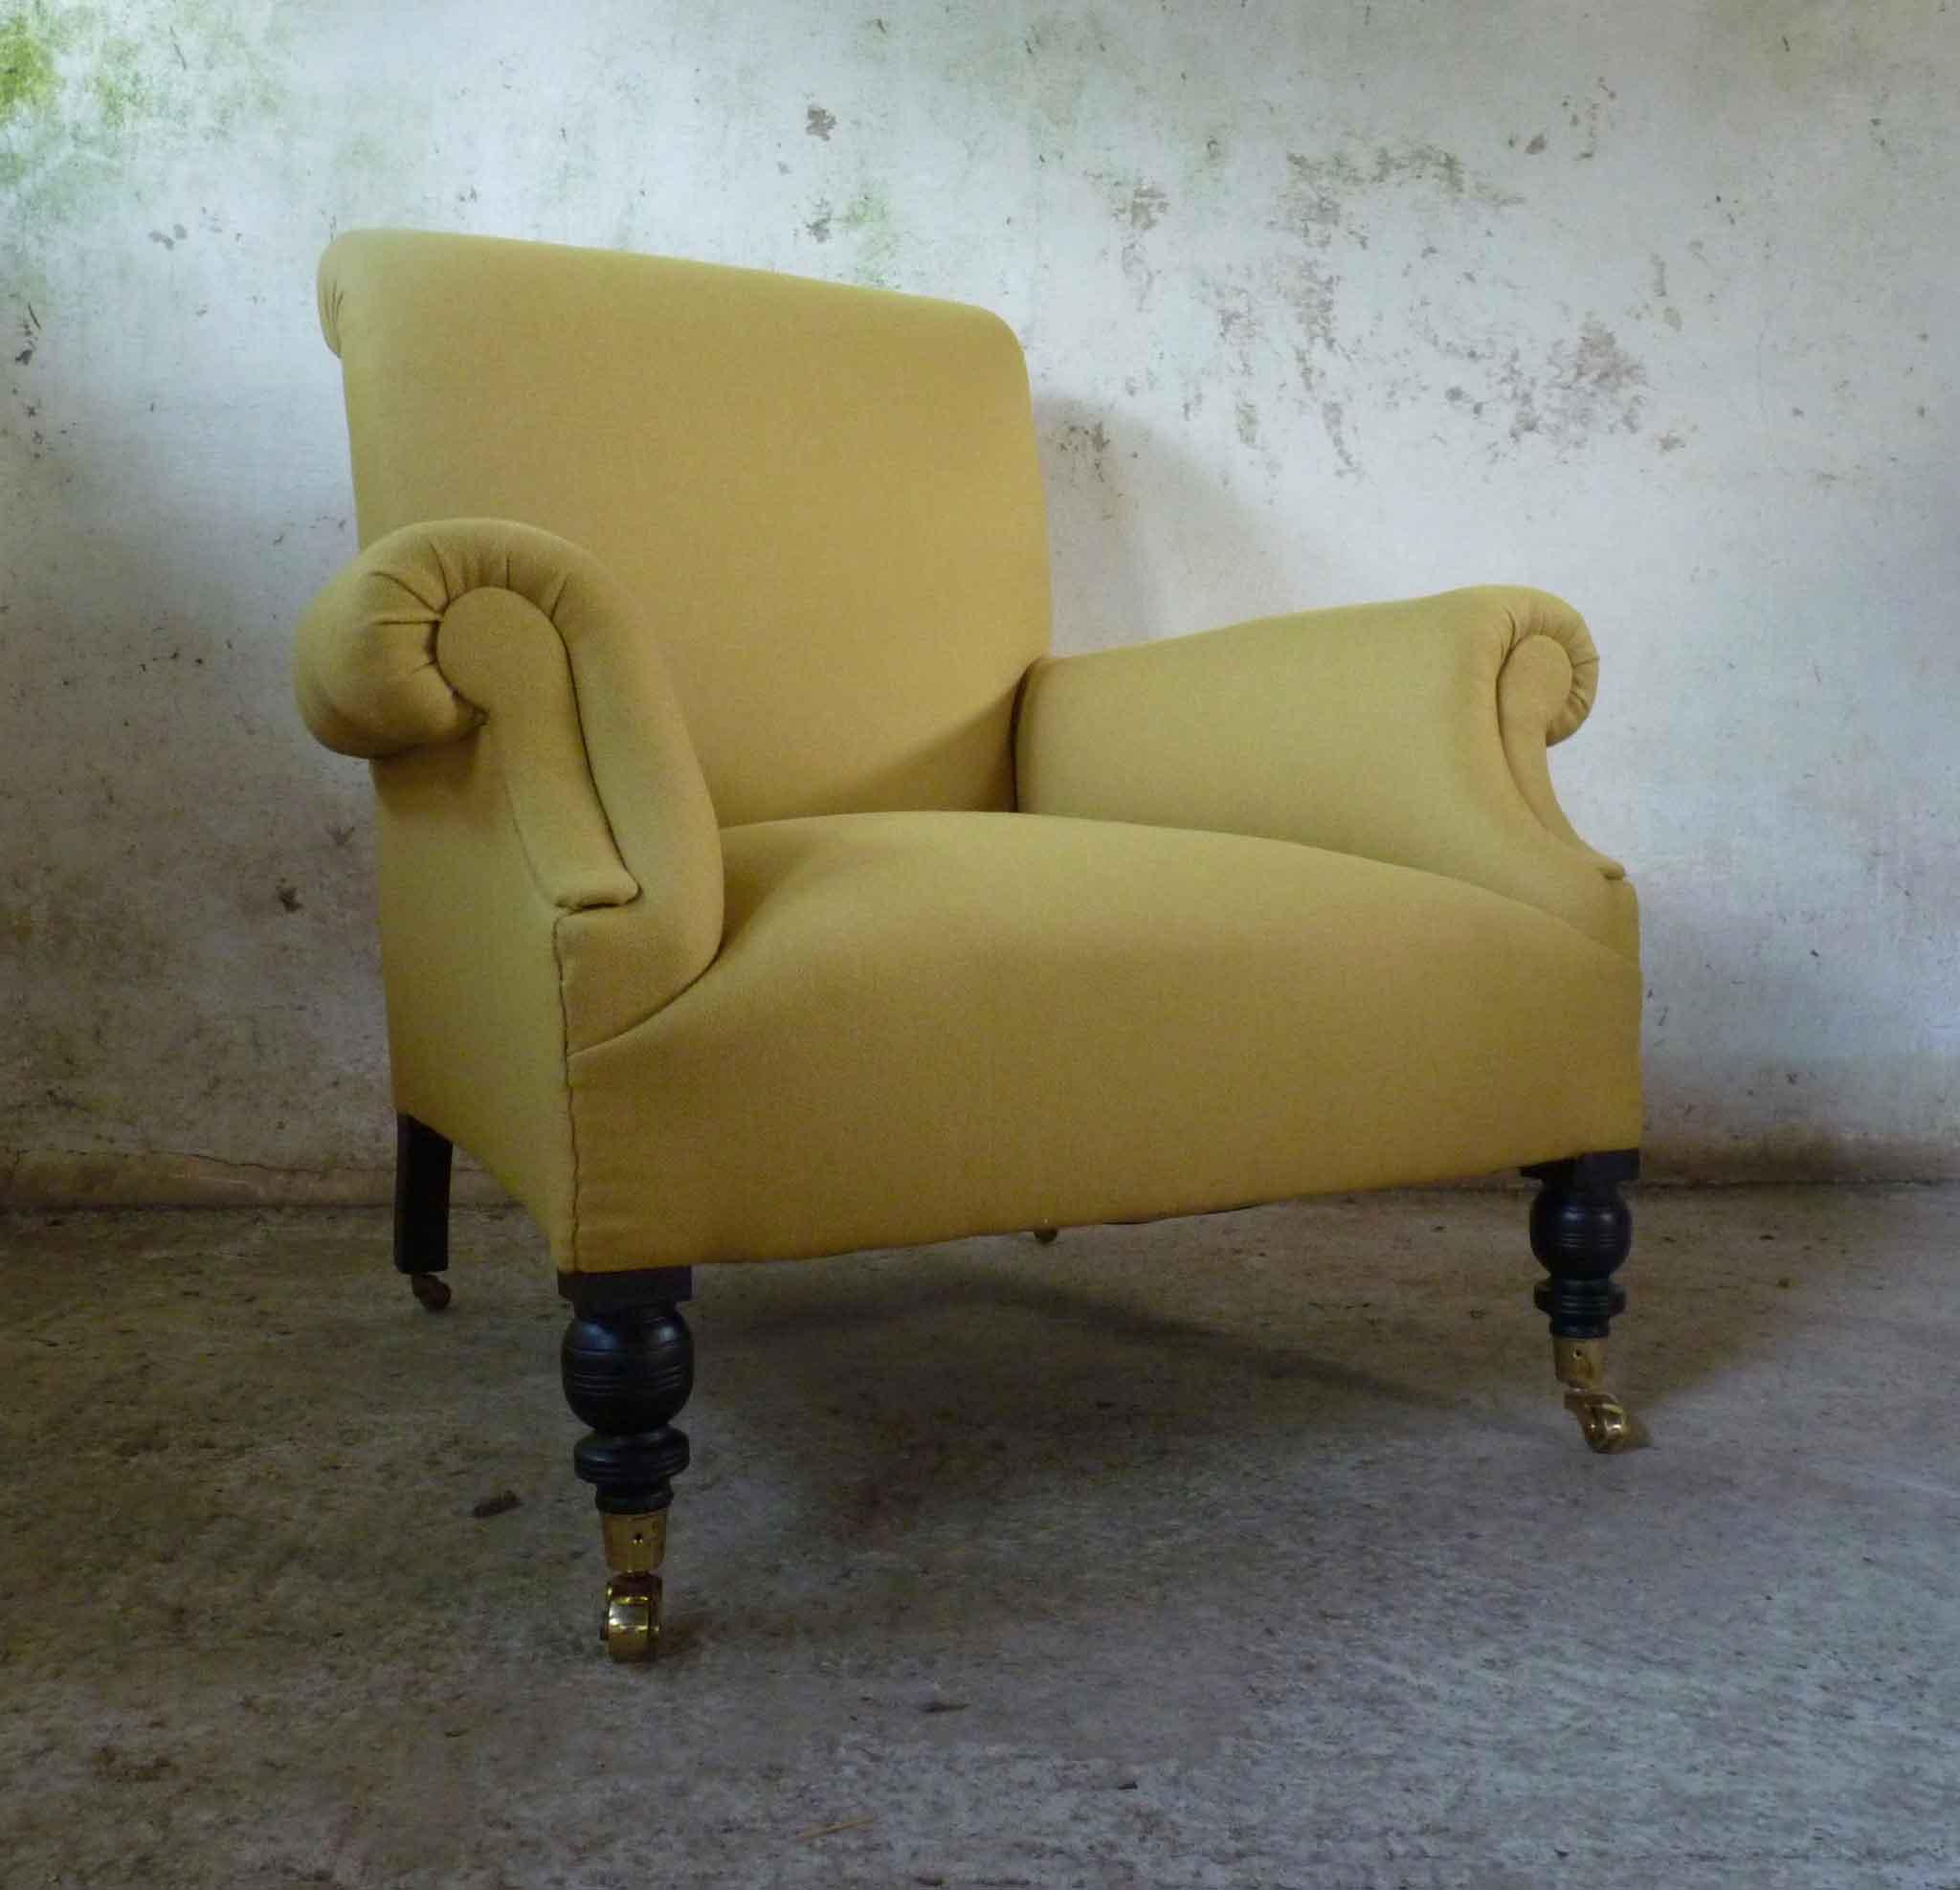 Early 20th century easy armchair